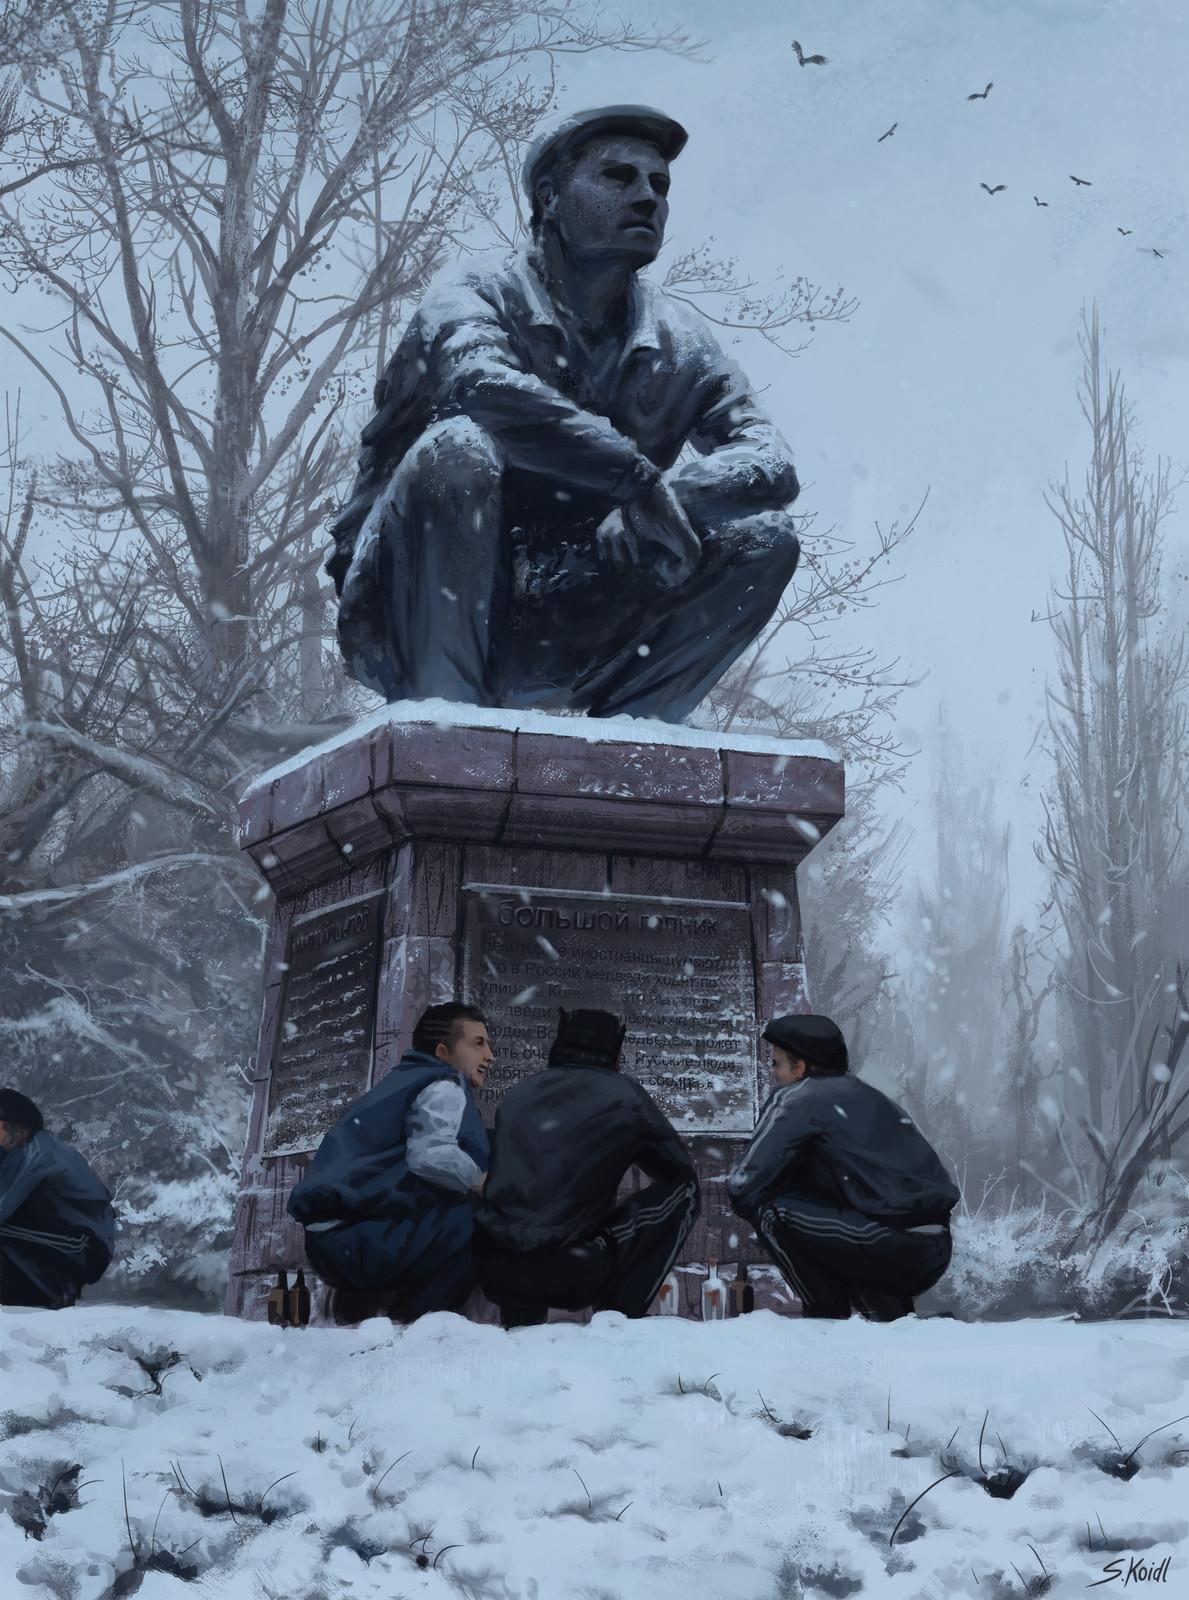 The great gopnik statue